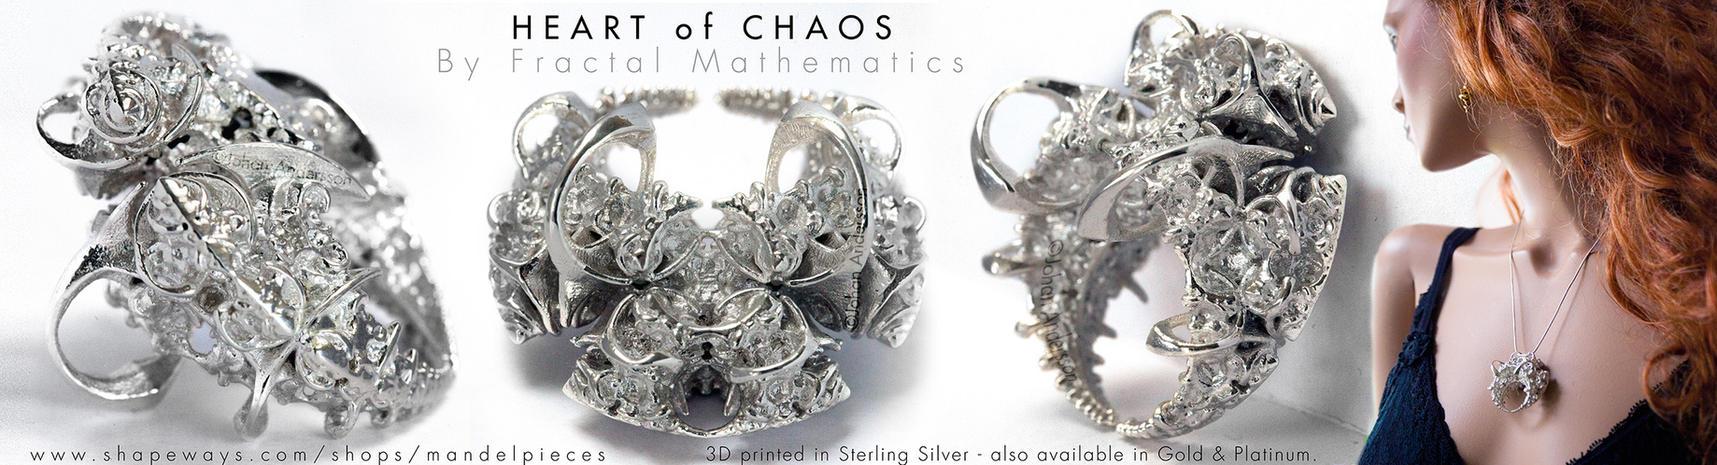 Heart of Chaos - Fractal Pendant - Sterling Silver by MANDELWERK